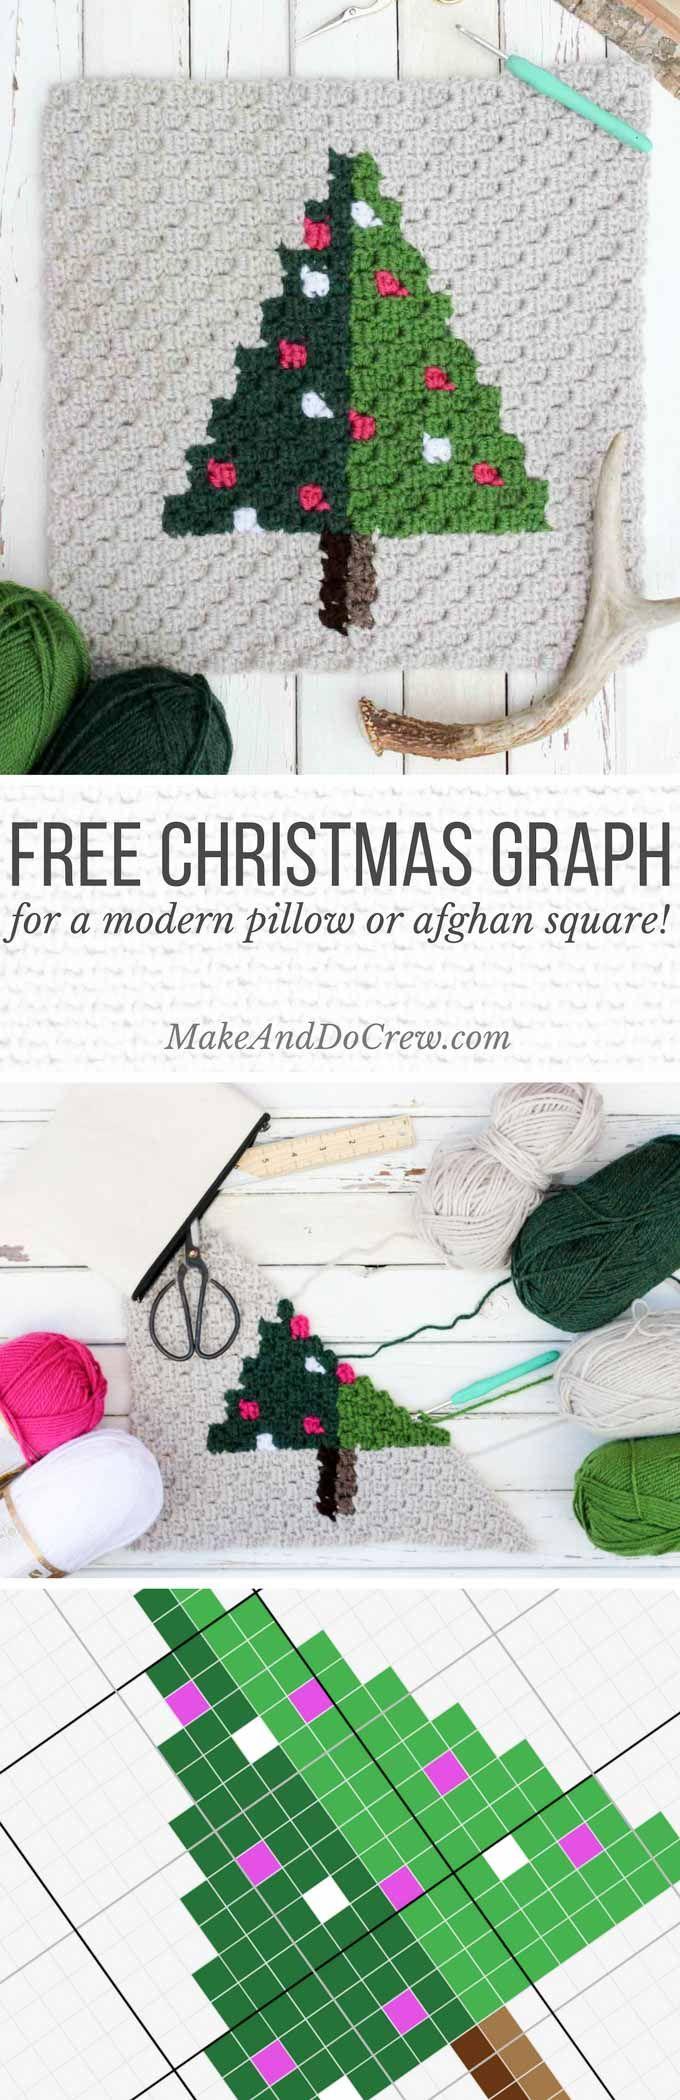 Best 20+ Corner To Corner Ideas On Pinterest  C2c Crochet Blanket, C2c  Crochet And C2c Crochet Baby Blanket Pattern